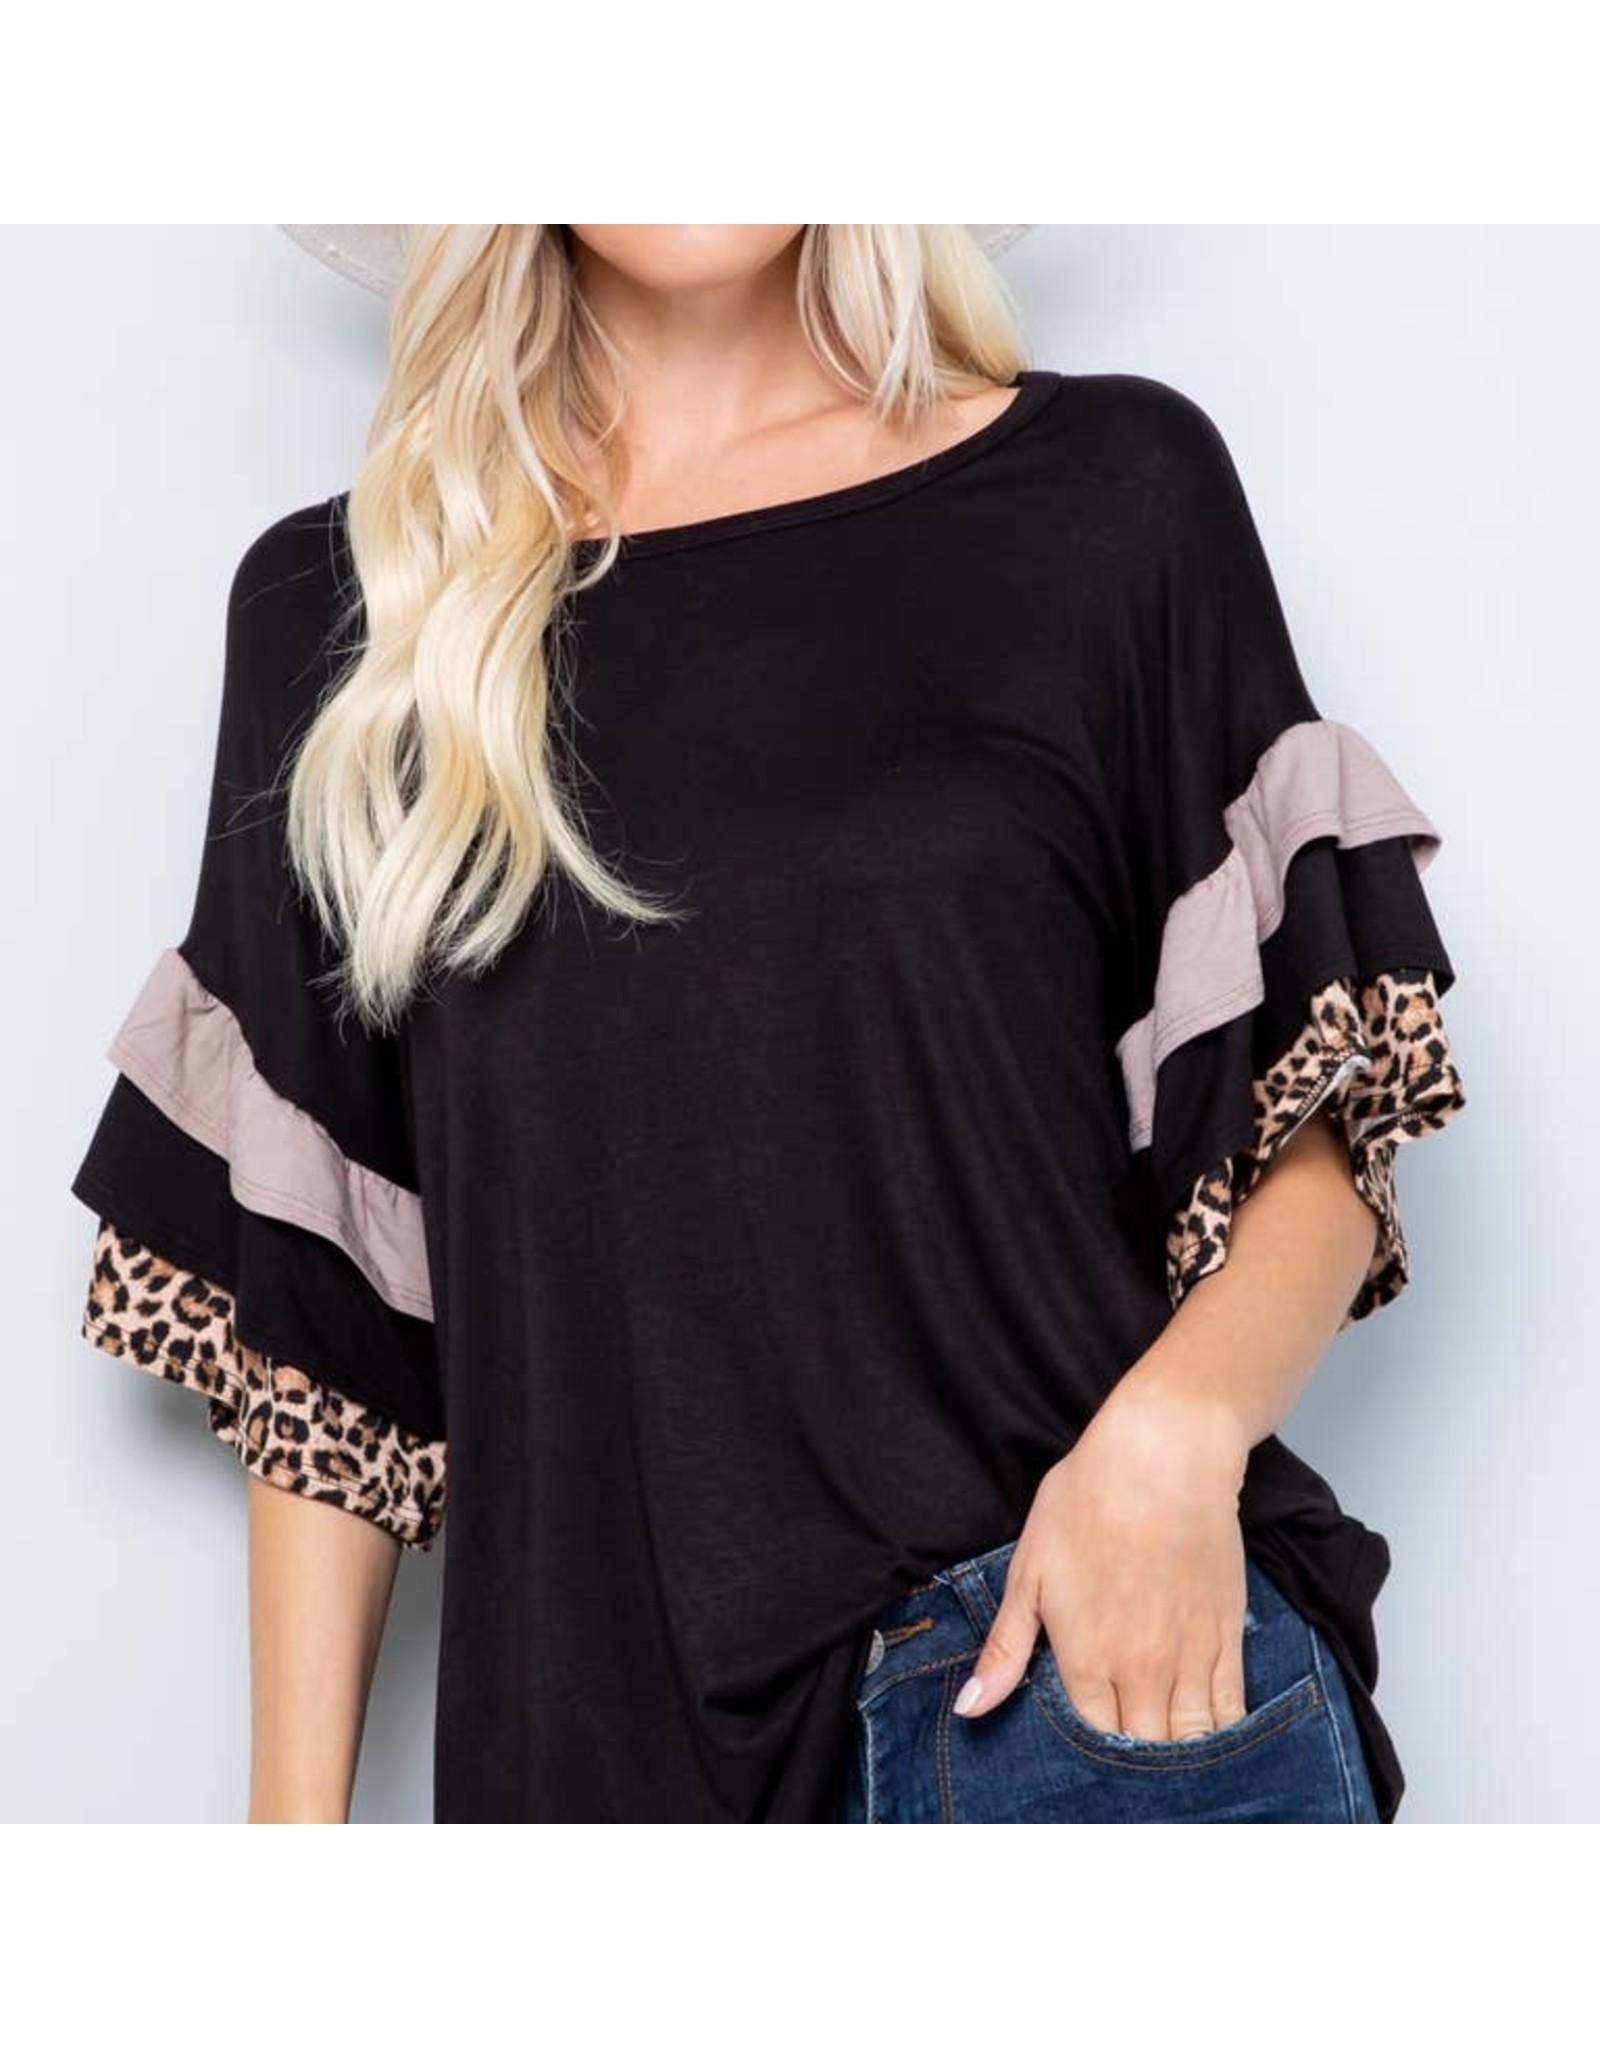 Celeste Clothing Black & Leopard Ruffle Top